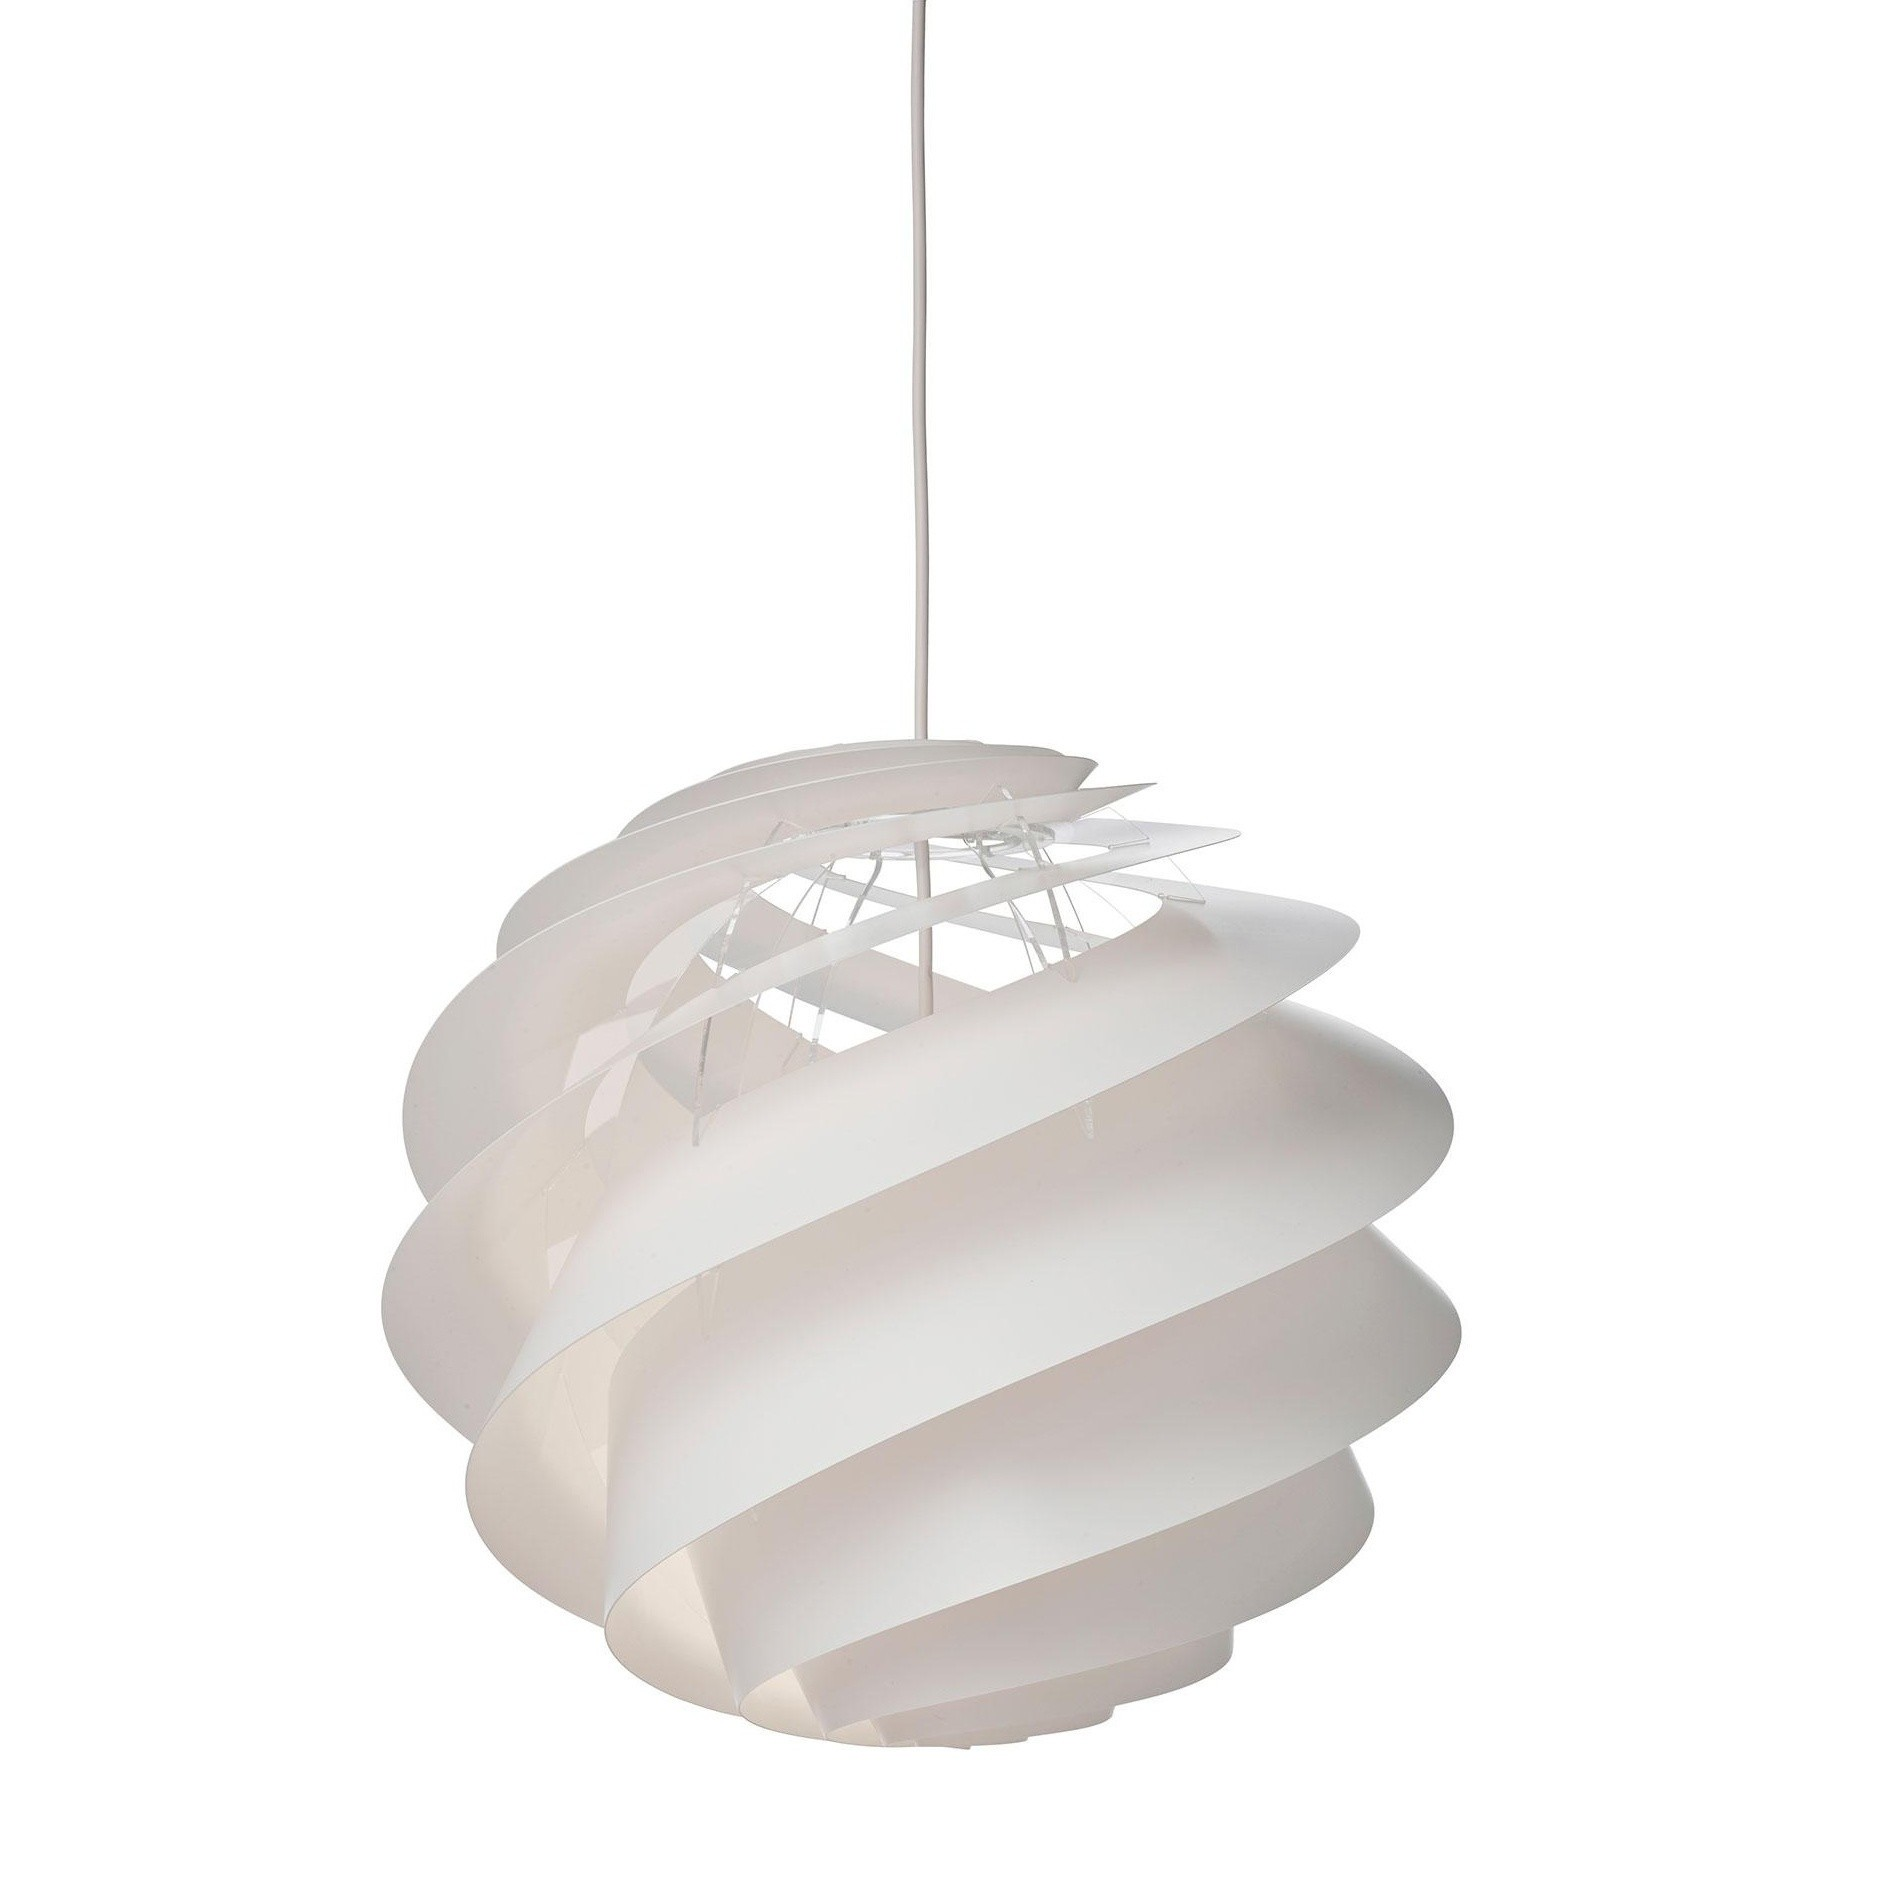 Le Klint Swirl 3 Suspension Lamp